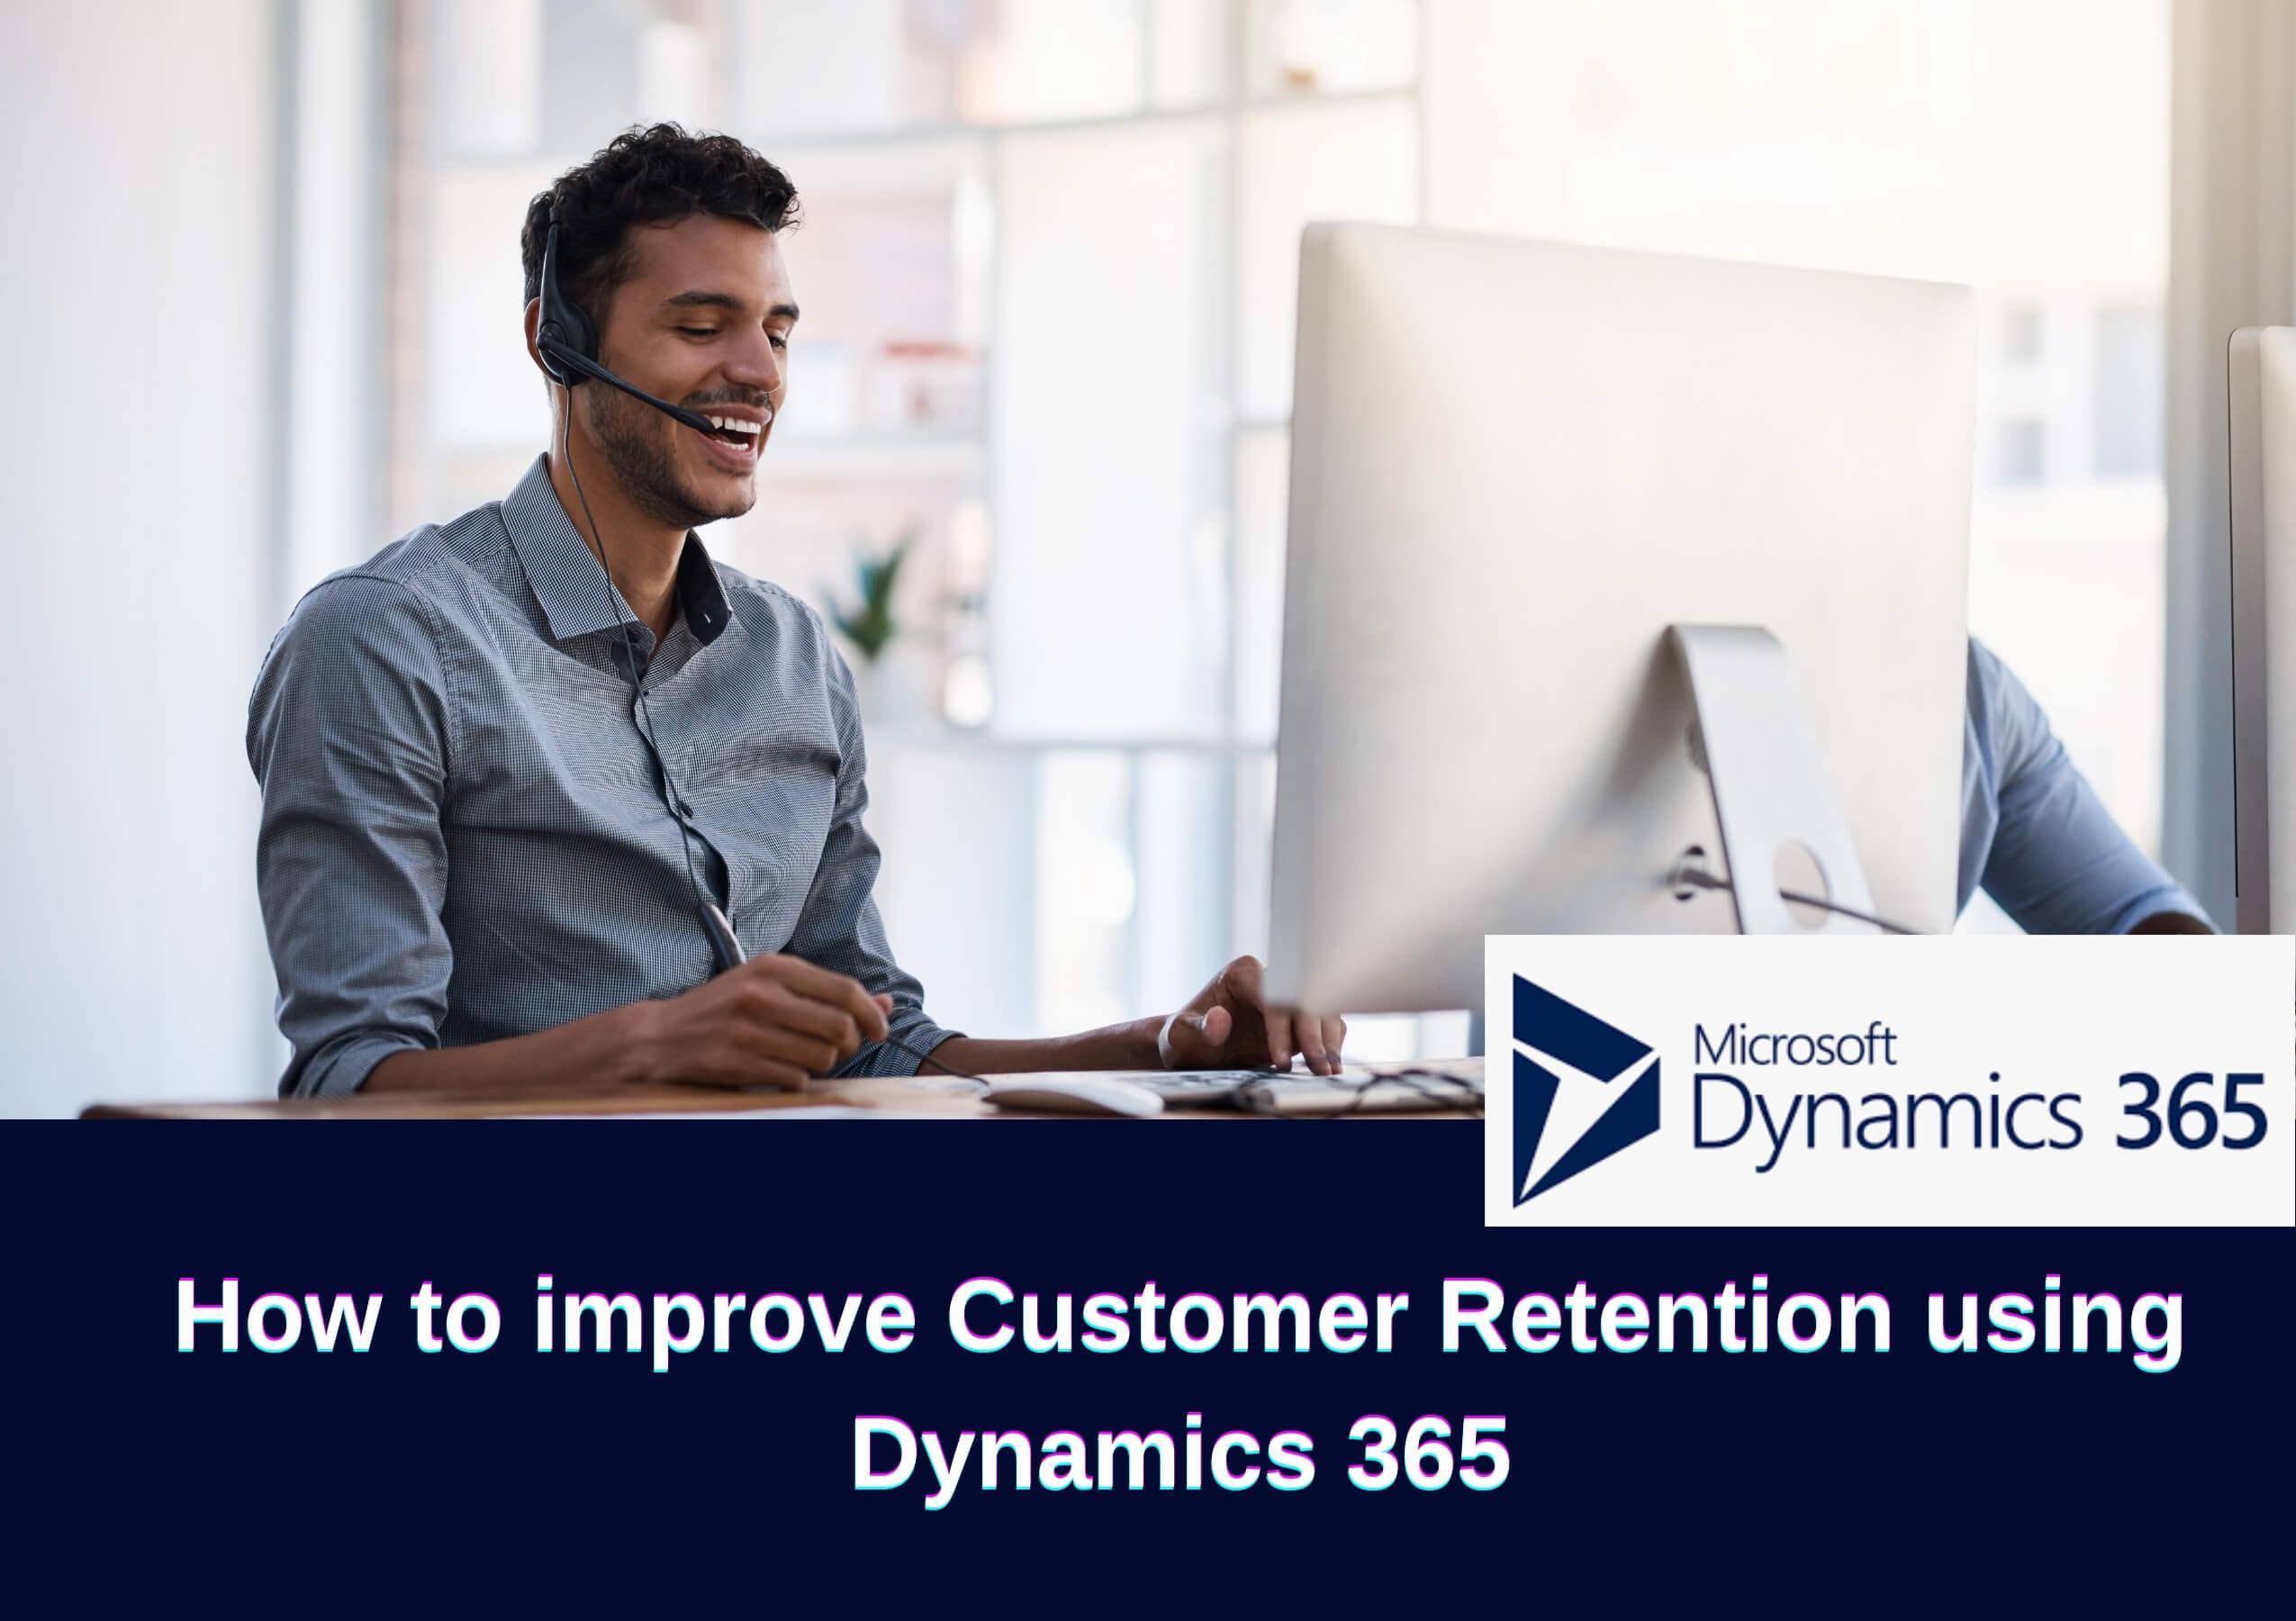 Improve Customer Retention using Dynamics 365